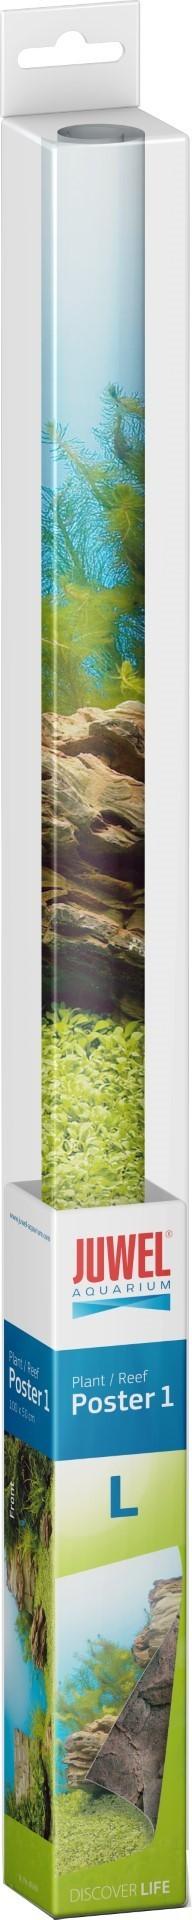 Juwel achterwand poster 1 L 100x50 cm